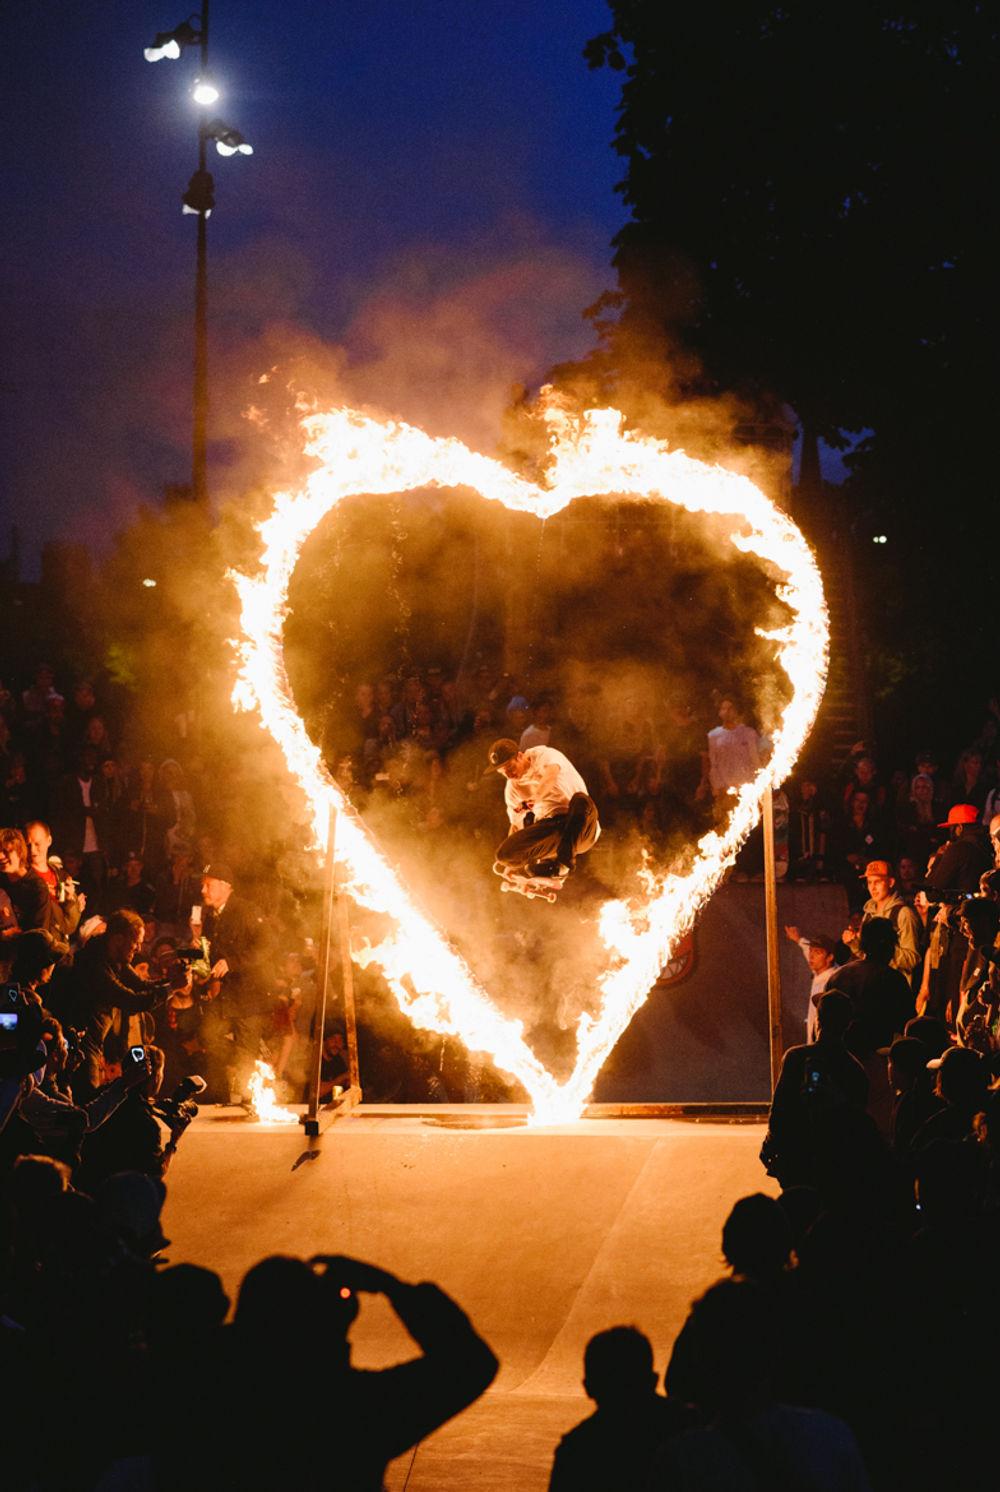 _IHC3426-Luan-Oliveira-Tucknee-Nike-SB-Copenhagen-Heart-On-Fire-Day-1-Faelledparken-July-2015-Photographer-Maksim-Kalanep